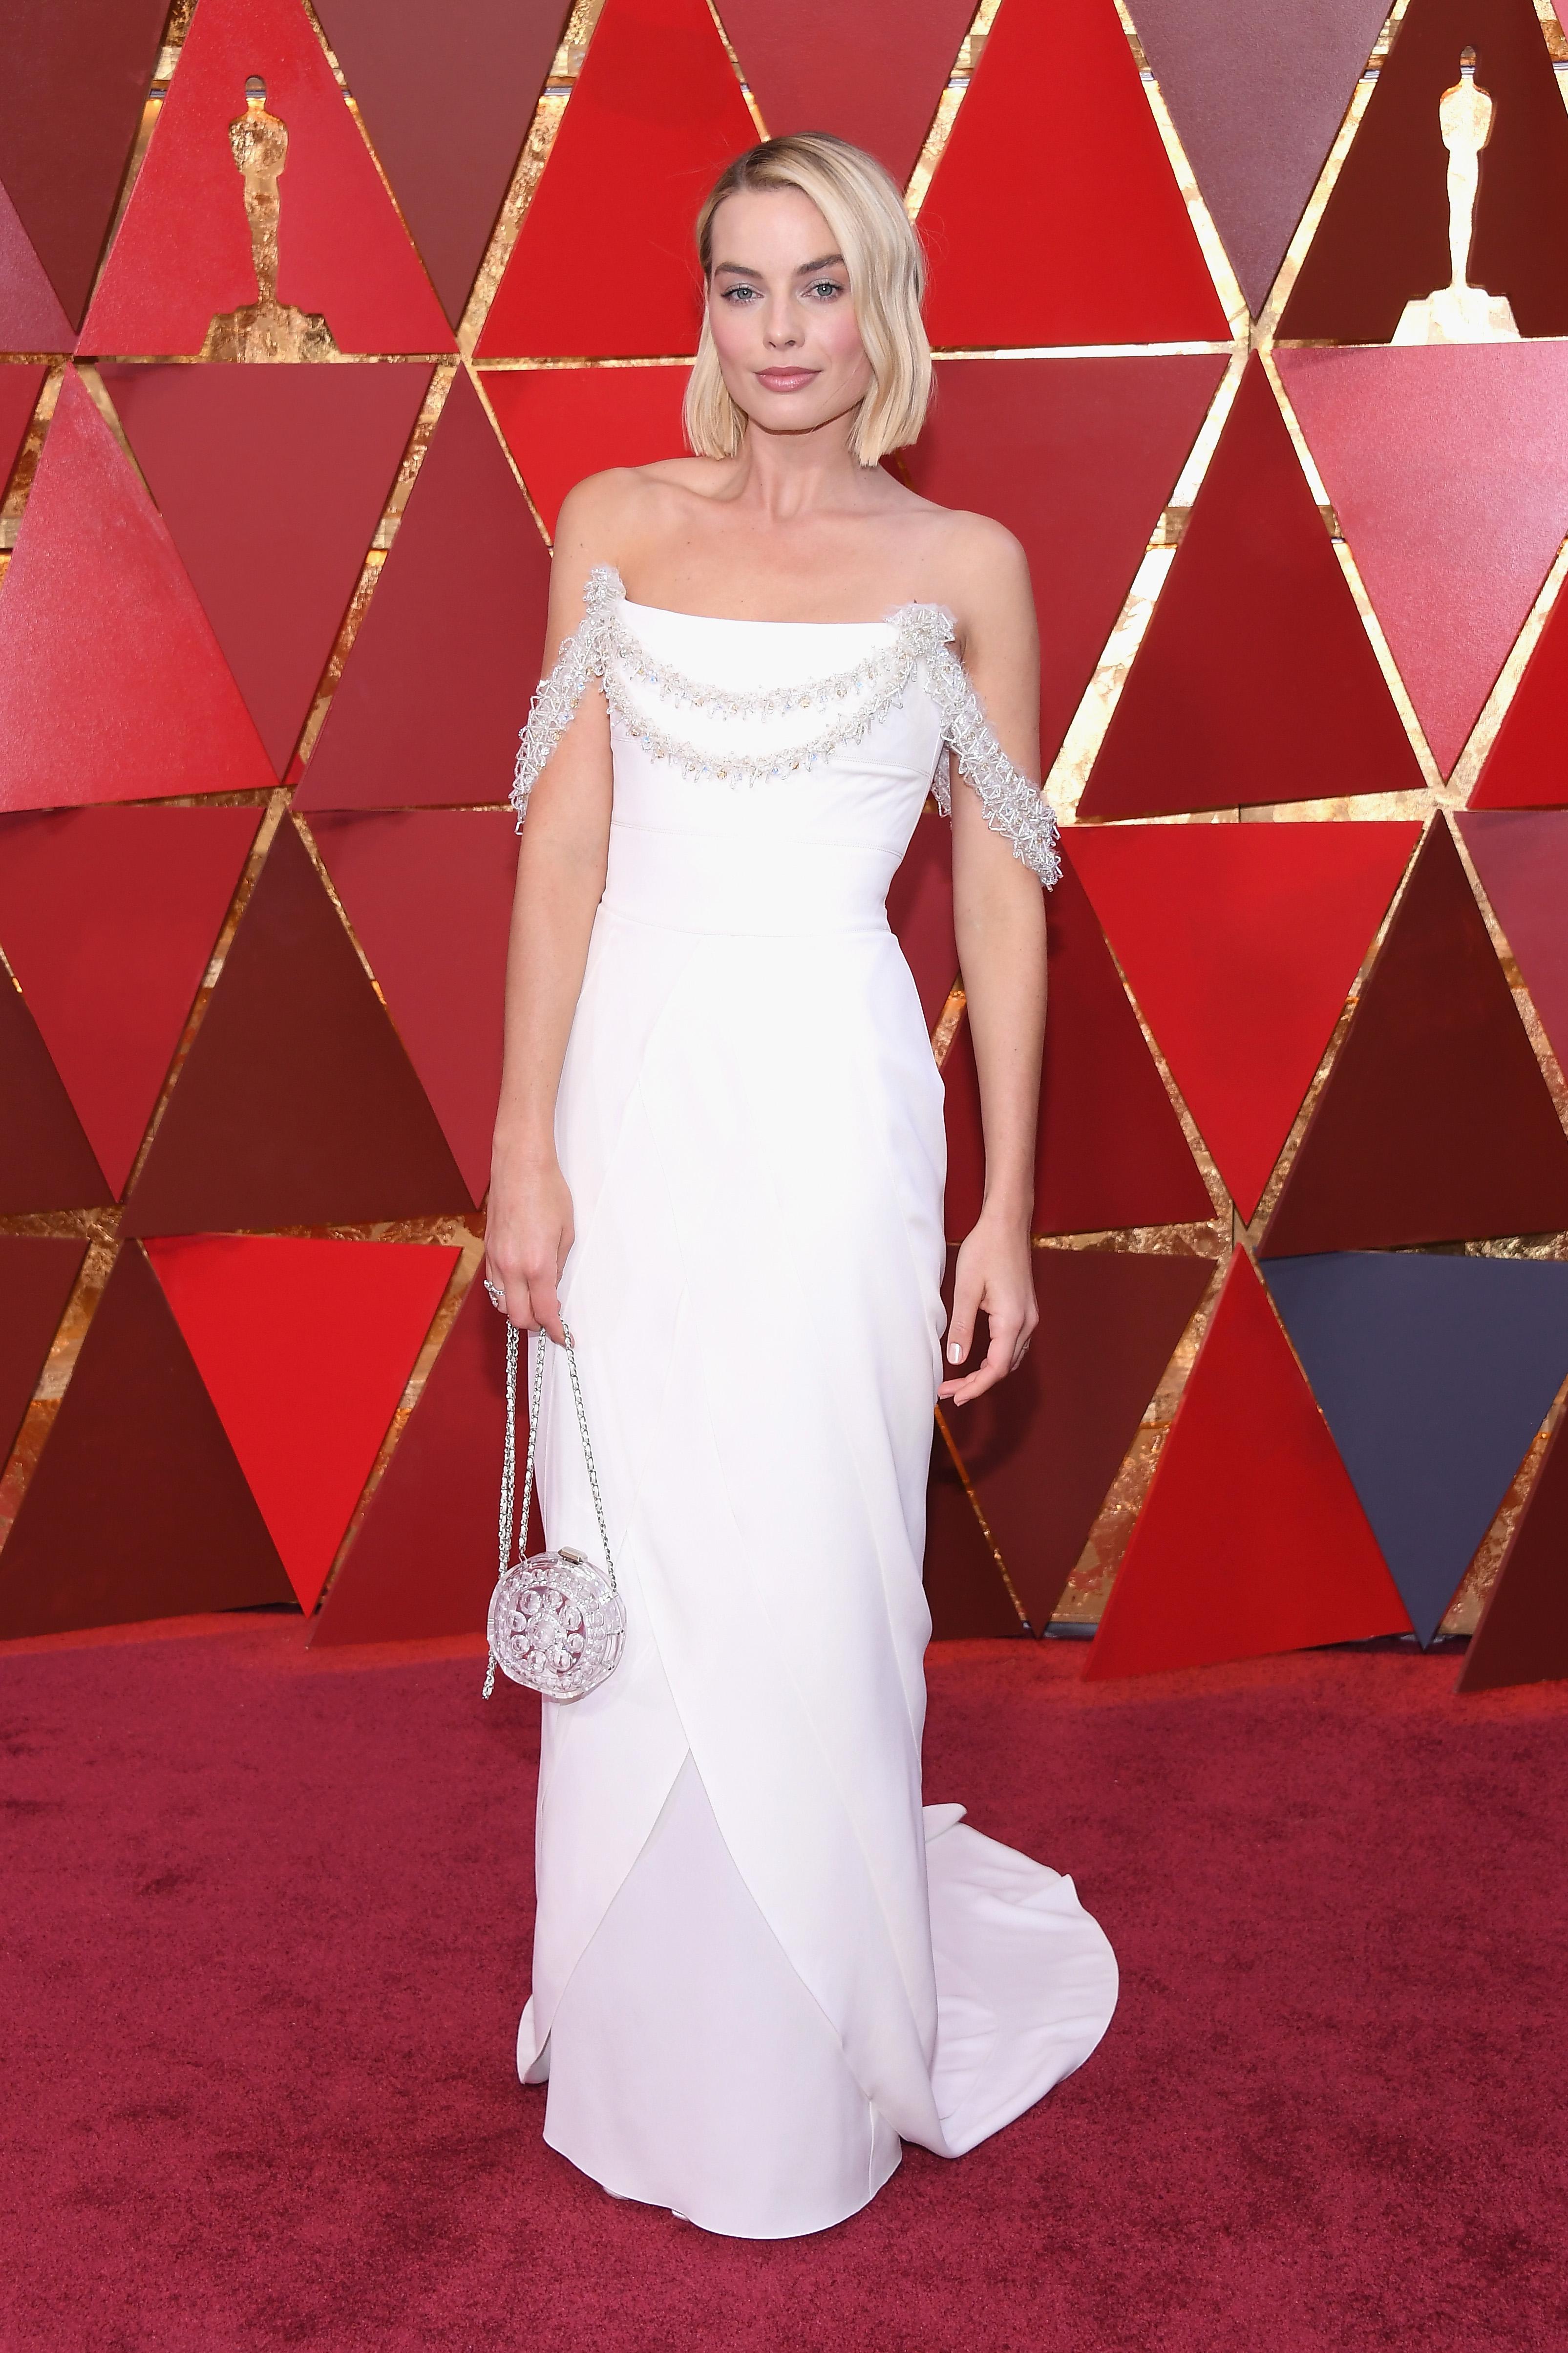 Oscars 2018 Red Carpet 15 Bridal,Inspired Wedding Dresses